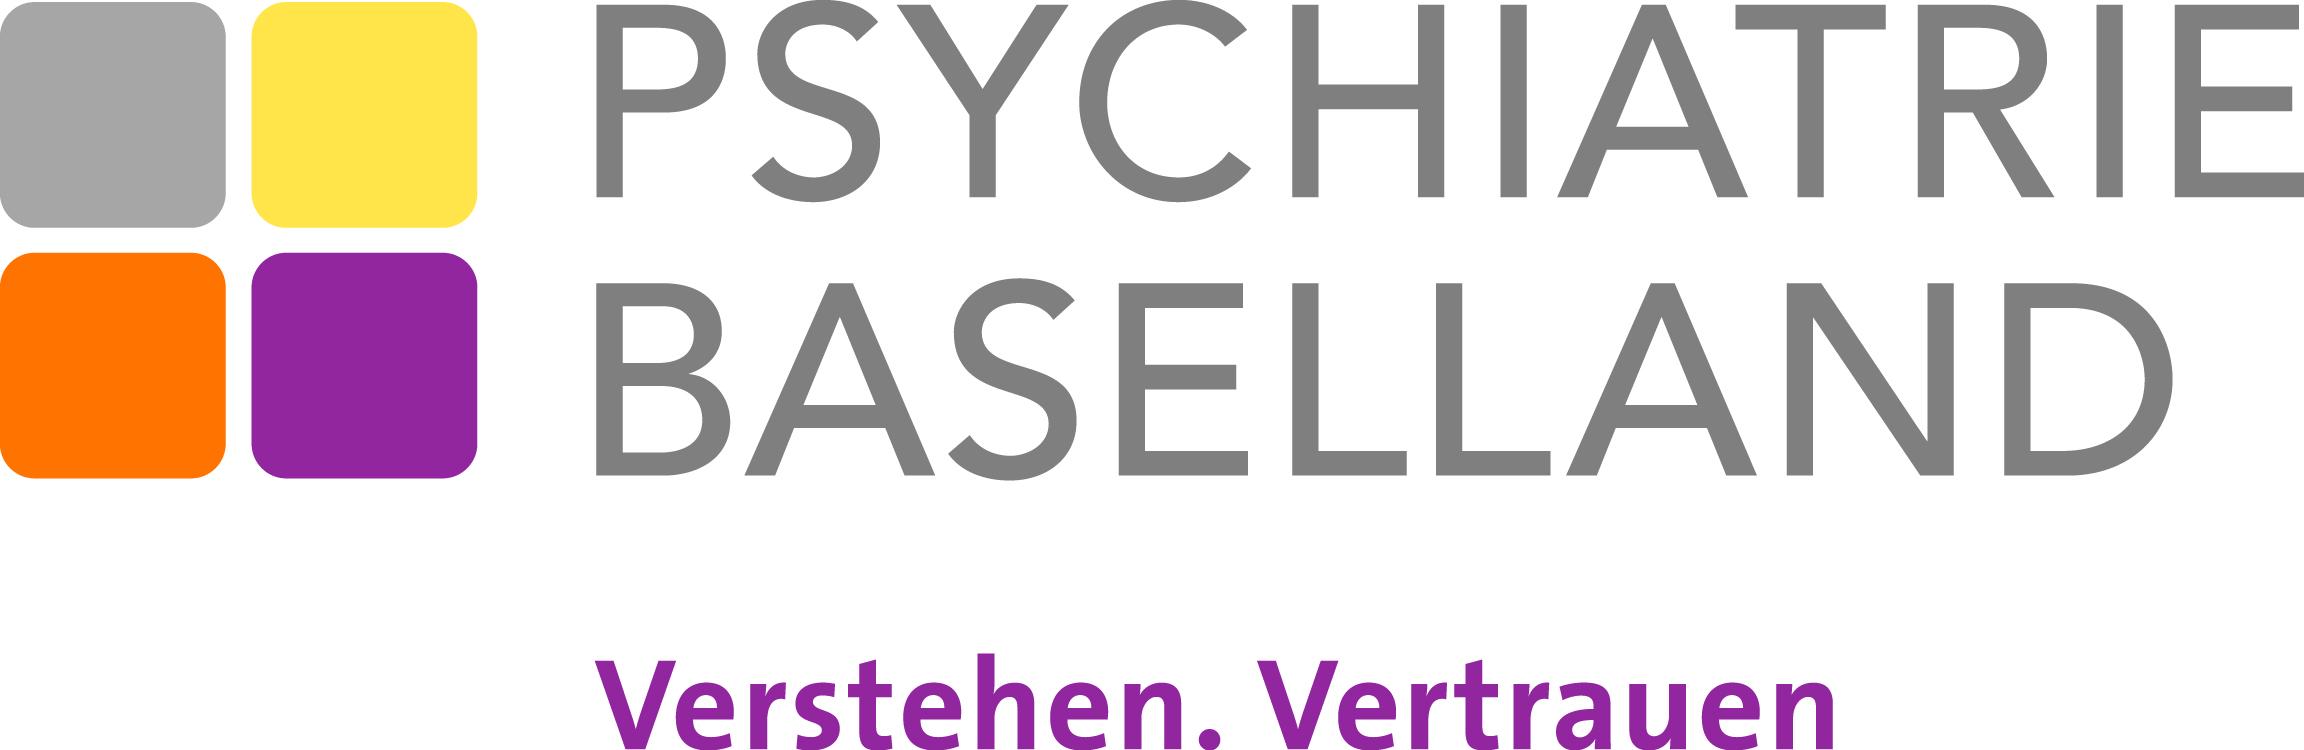 cobra CRM-Lösungen beiPsychiatrie Baselland